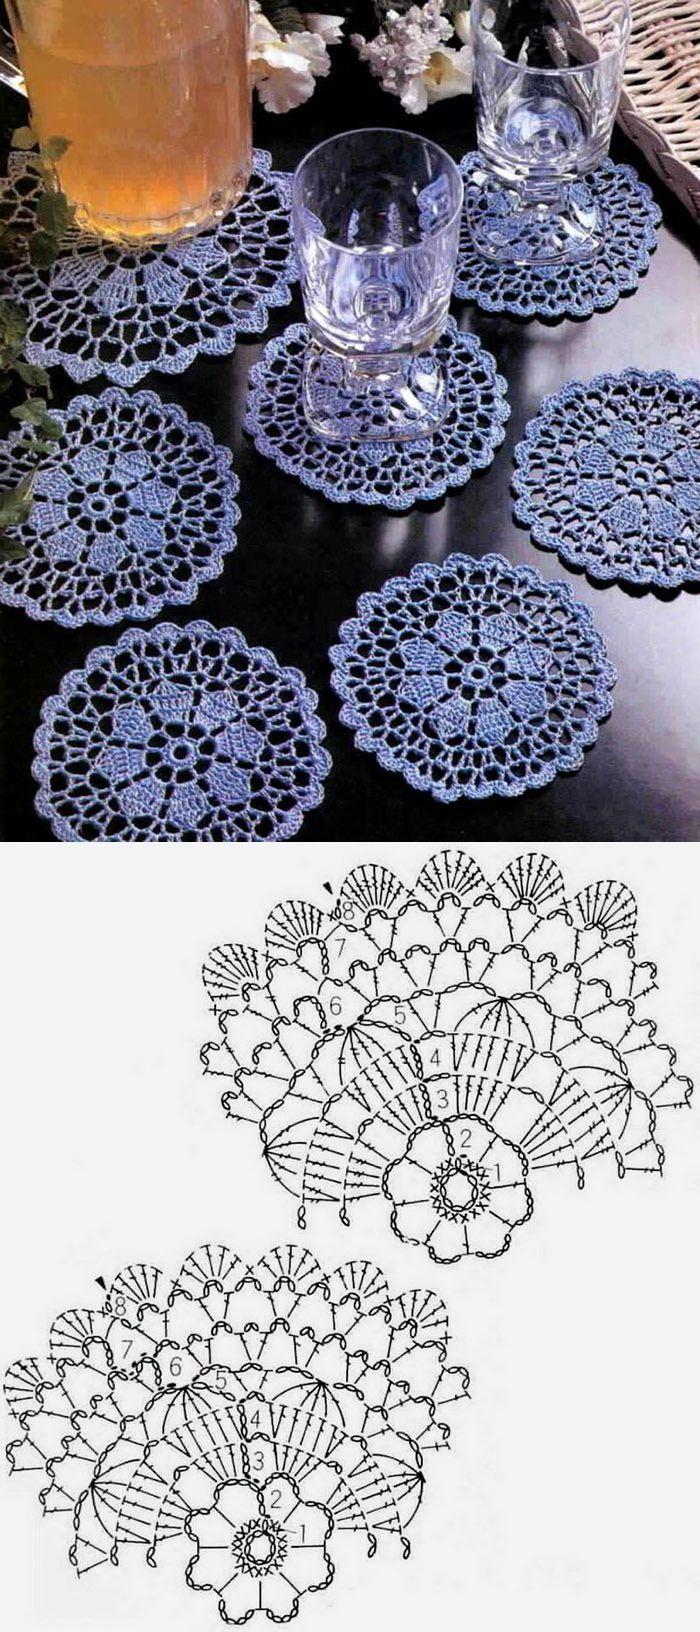 Crochet doily 20 free pattern / 20 схем для вязания салфеток крючком ...